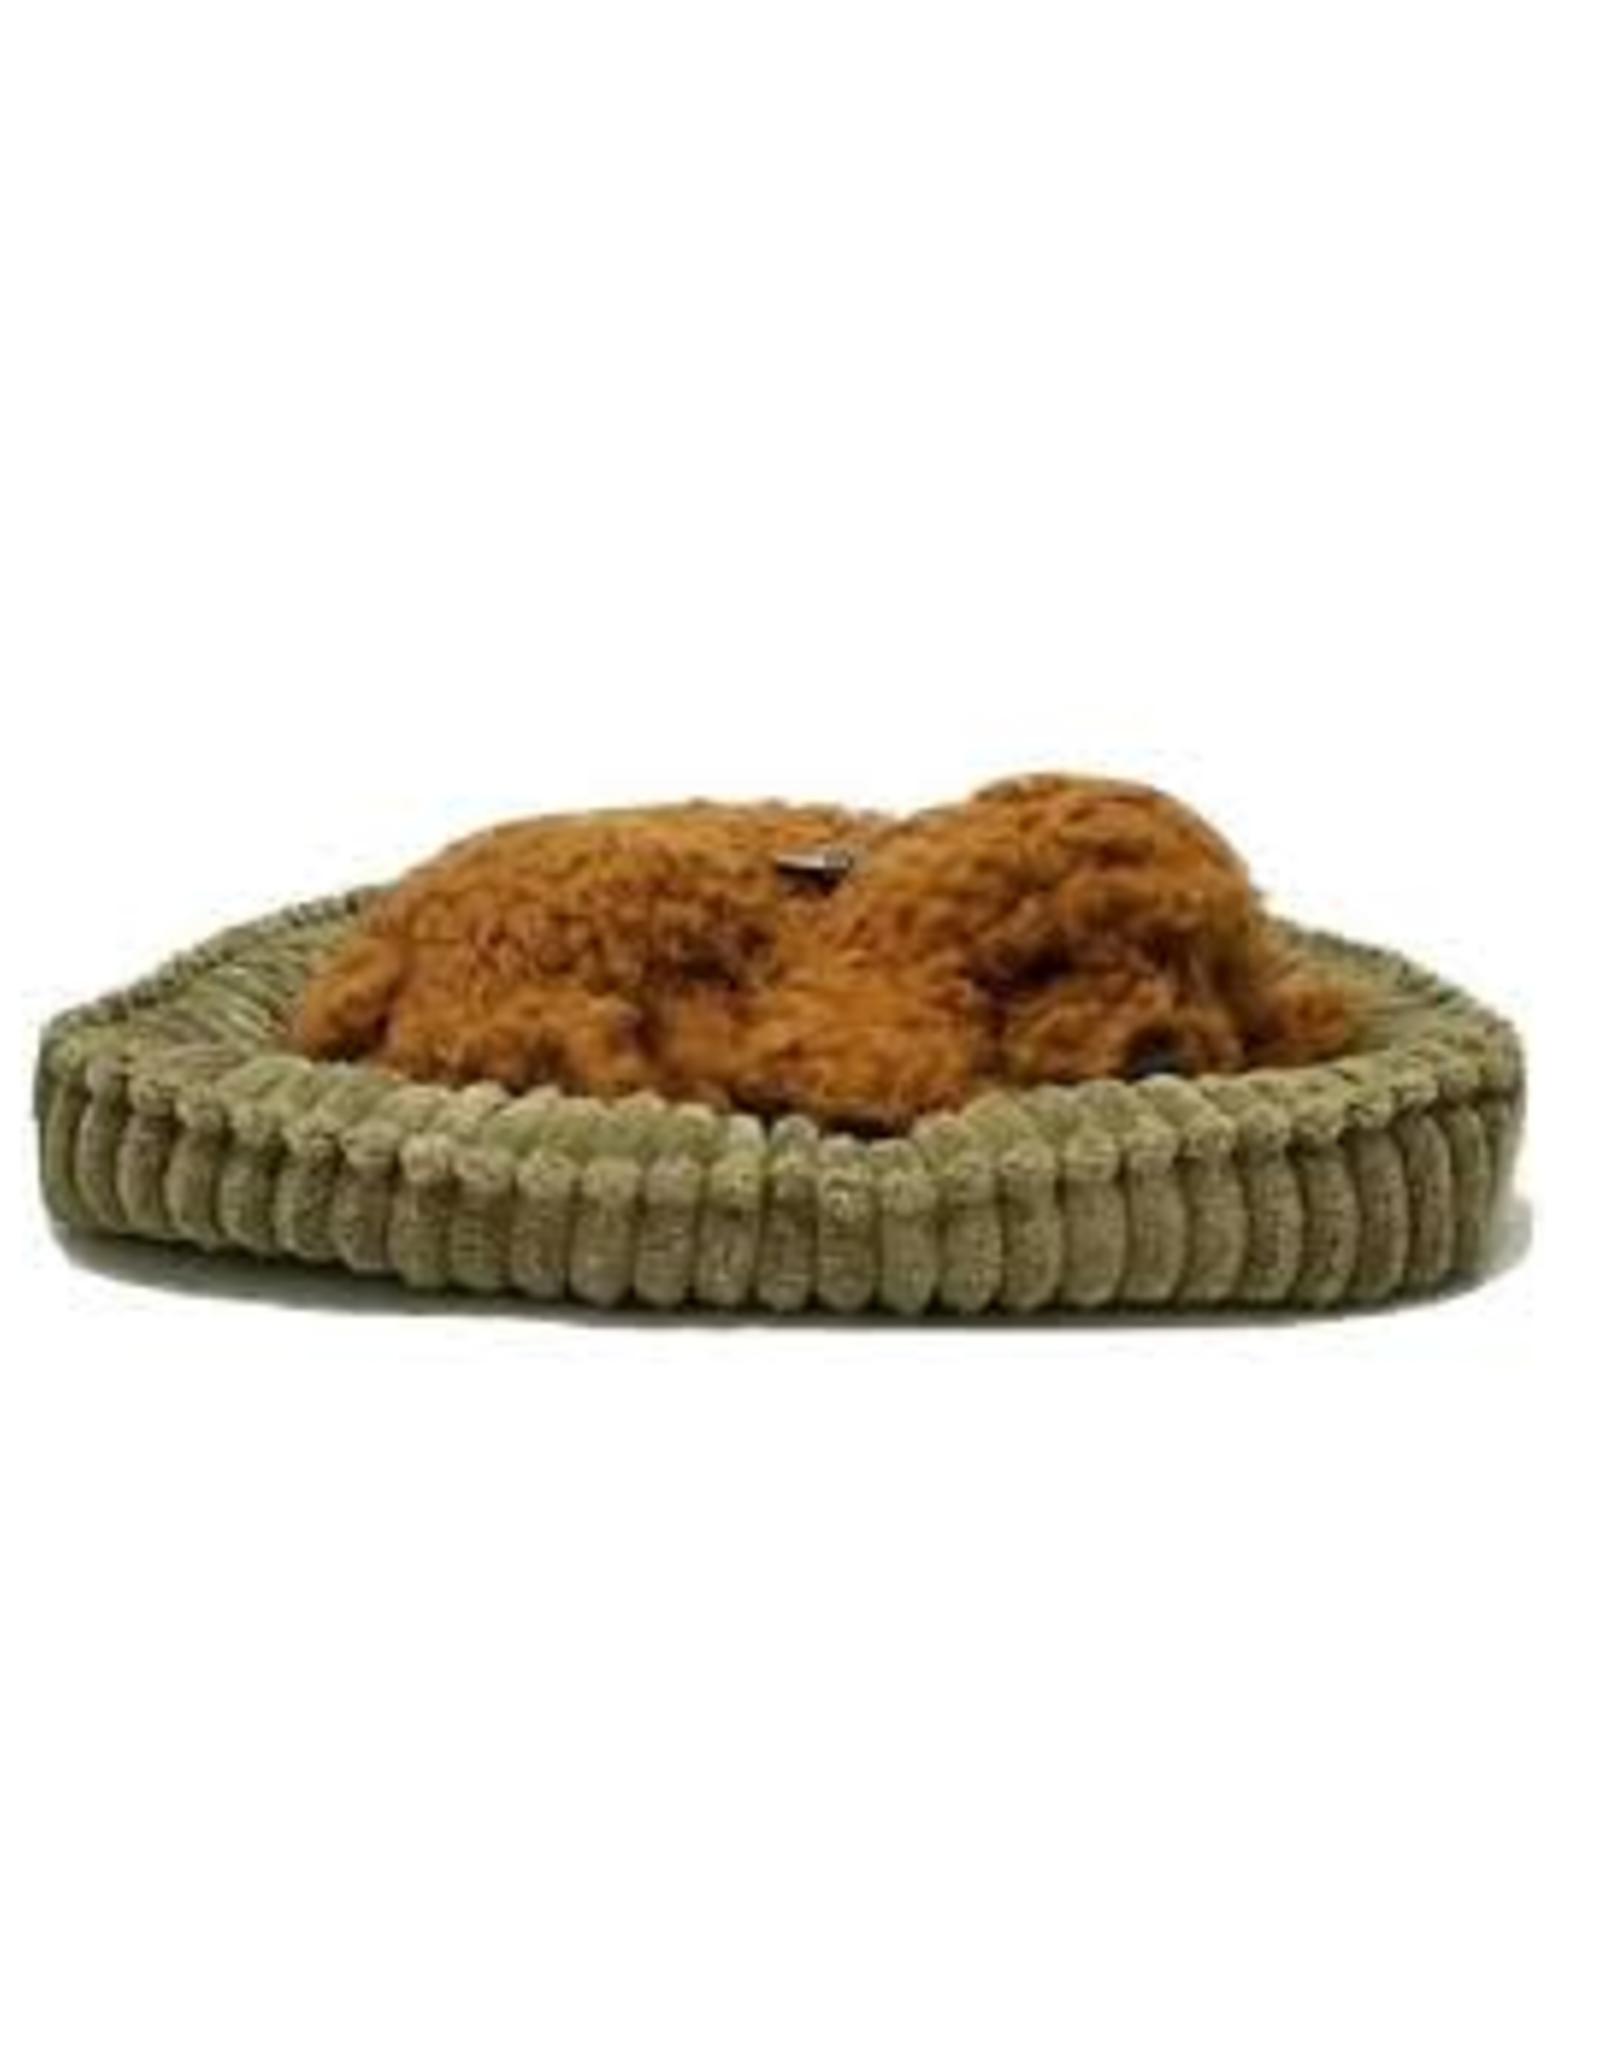 Perfect Petzzz Toy Poodle